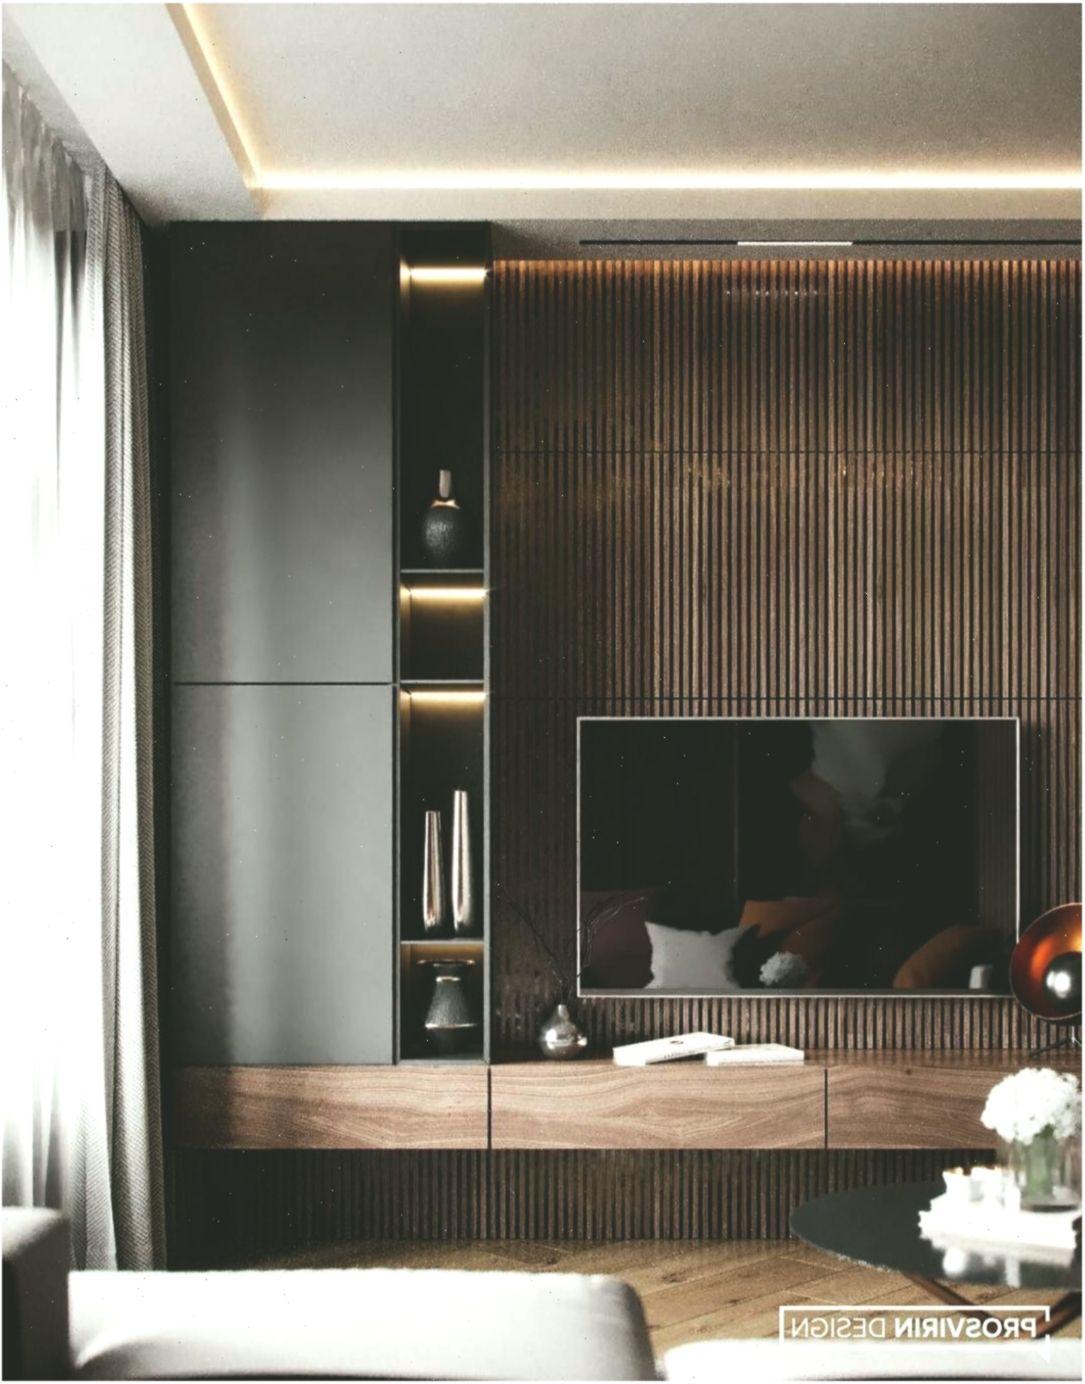 8 Amazing High End Outdoor Furniture Brands In 2020 Decor Design Furniture